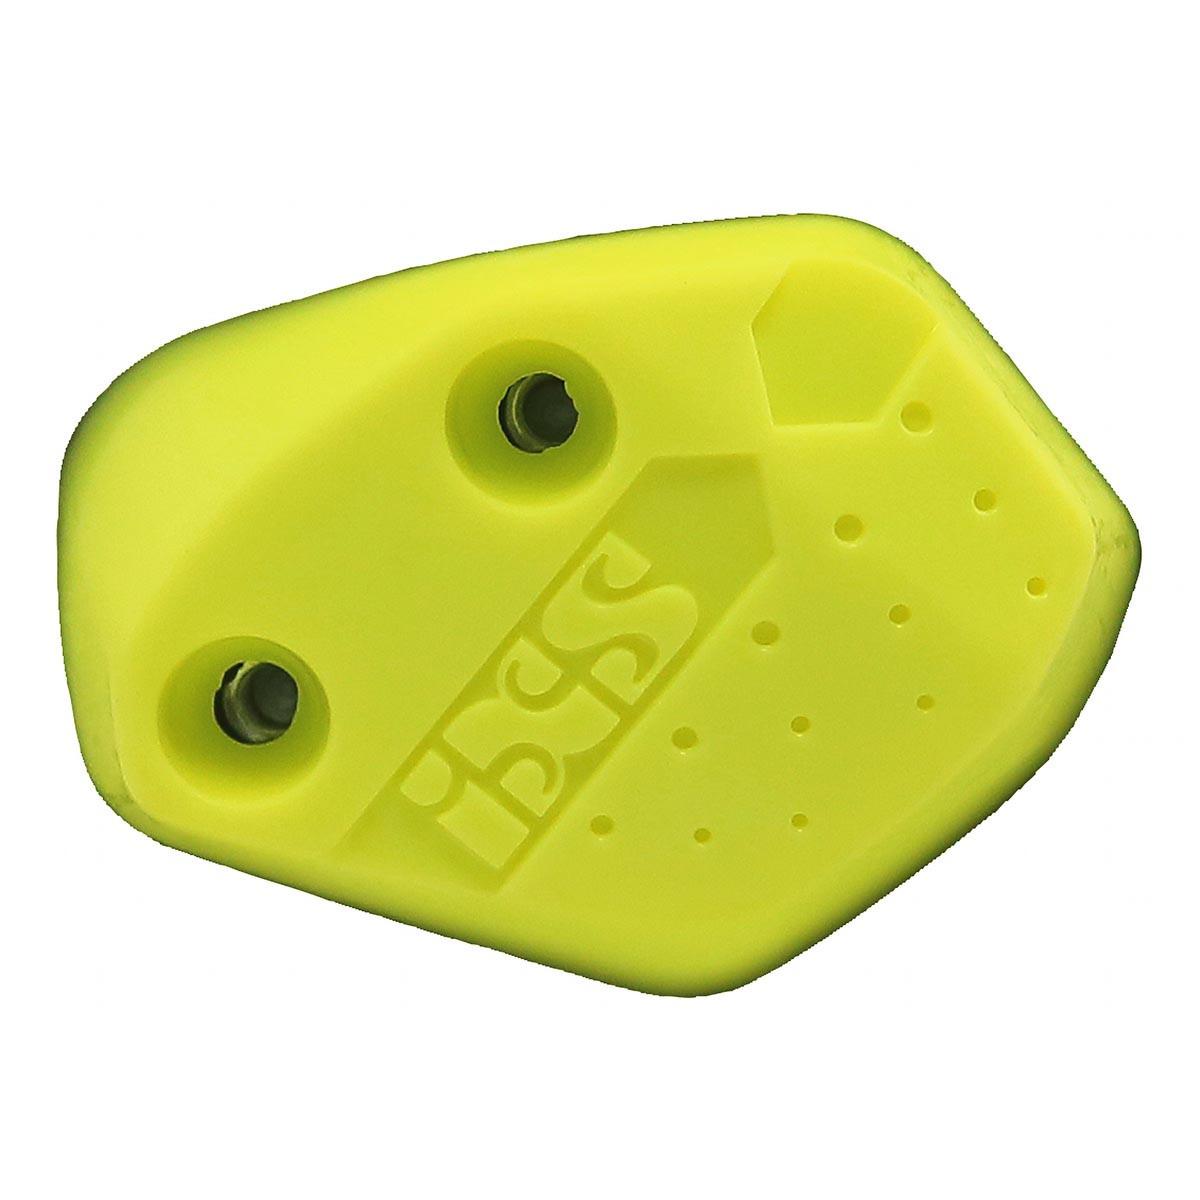 ELBOW SLIDER RS-1000 1